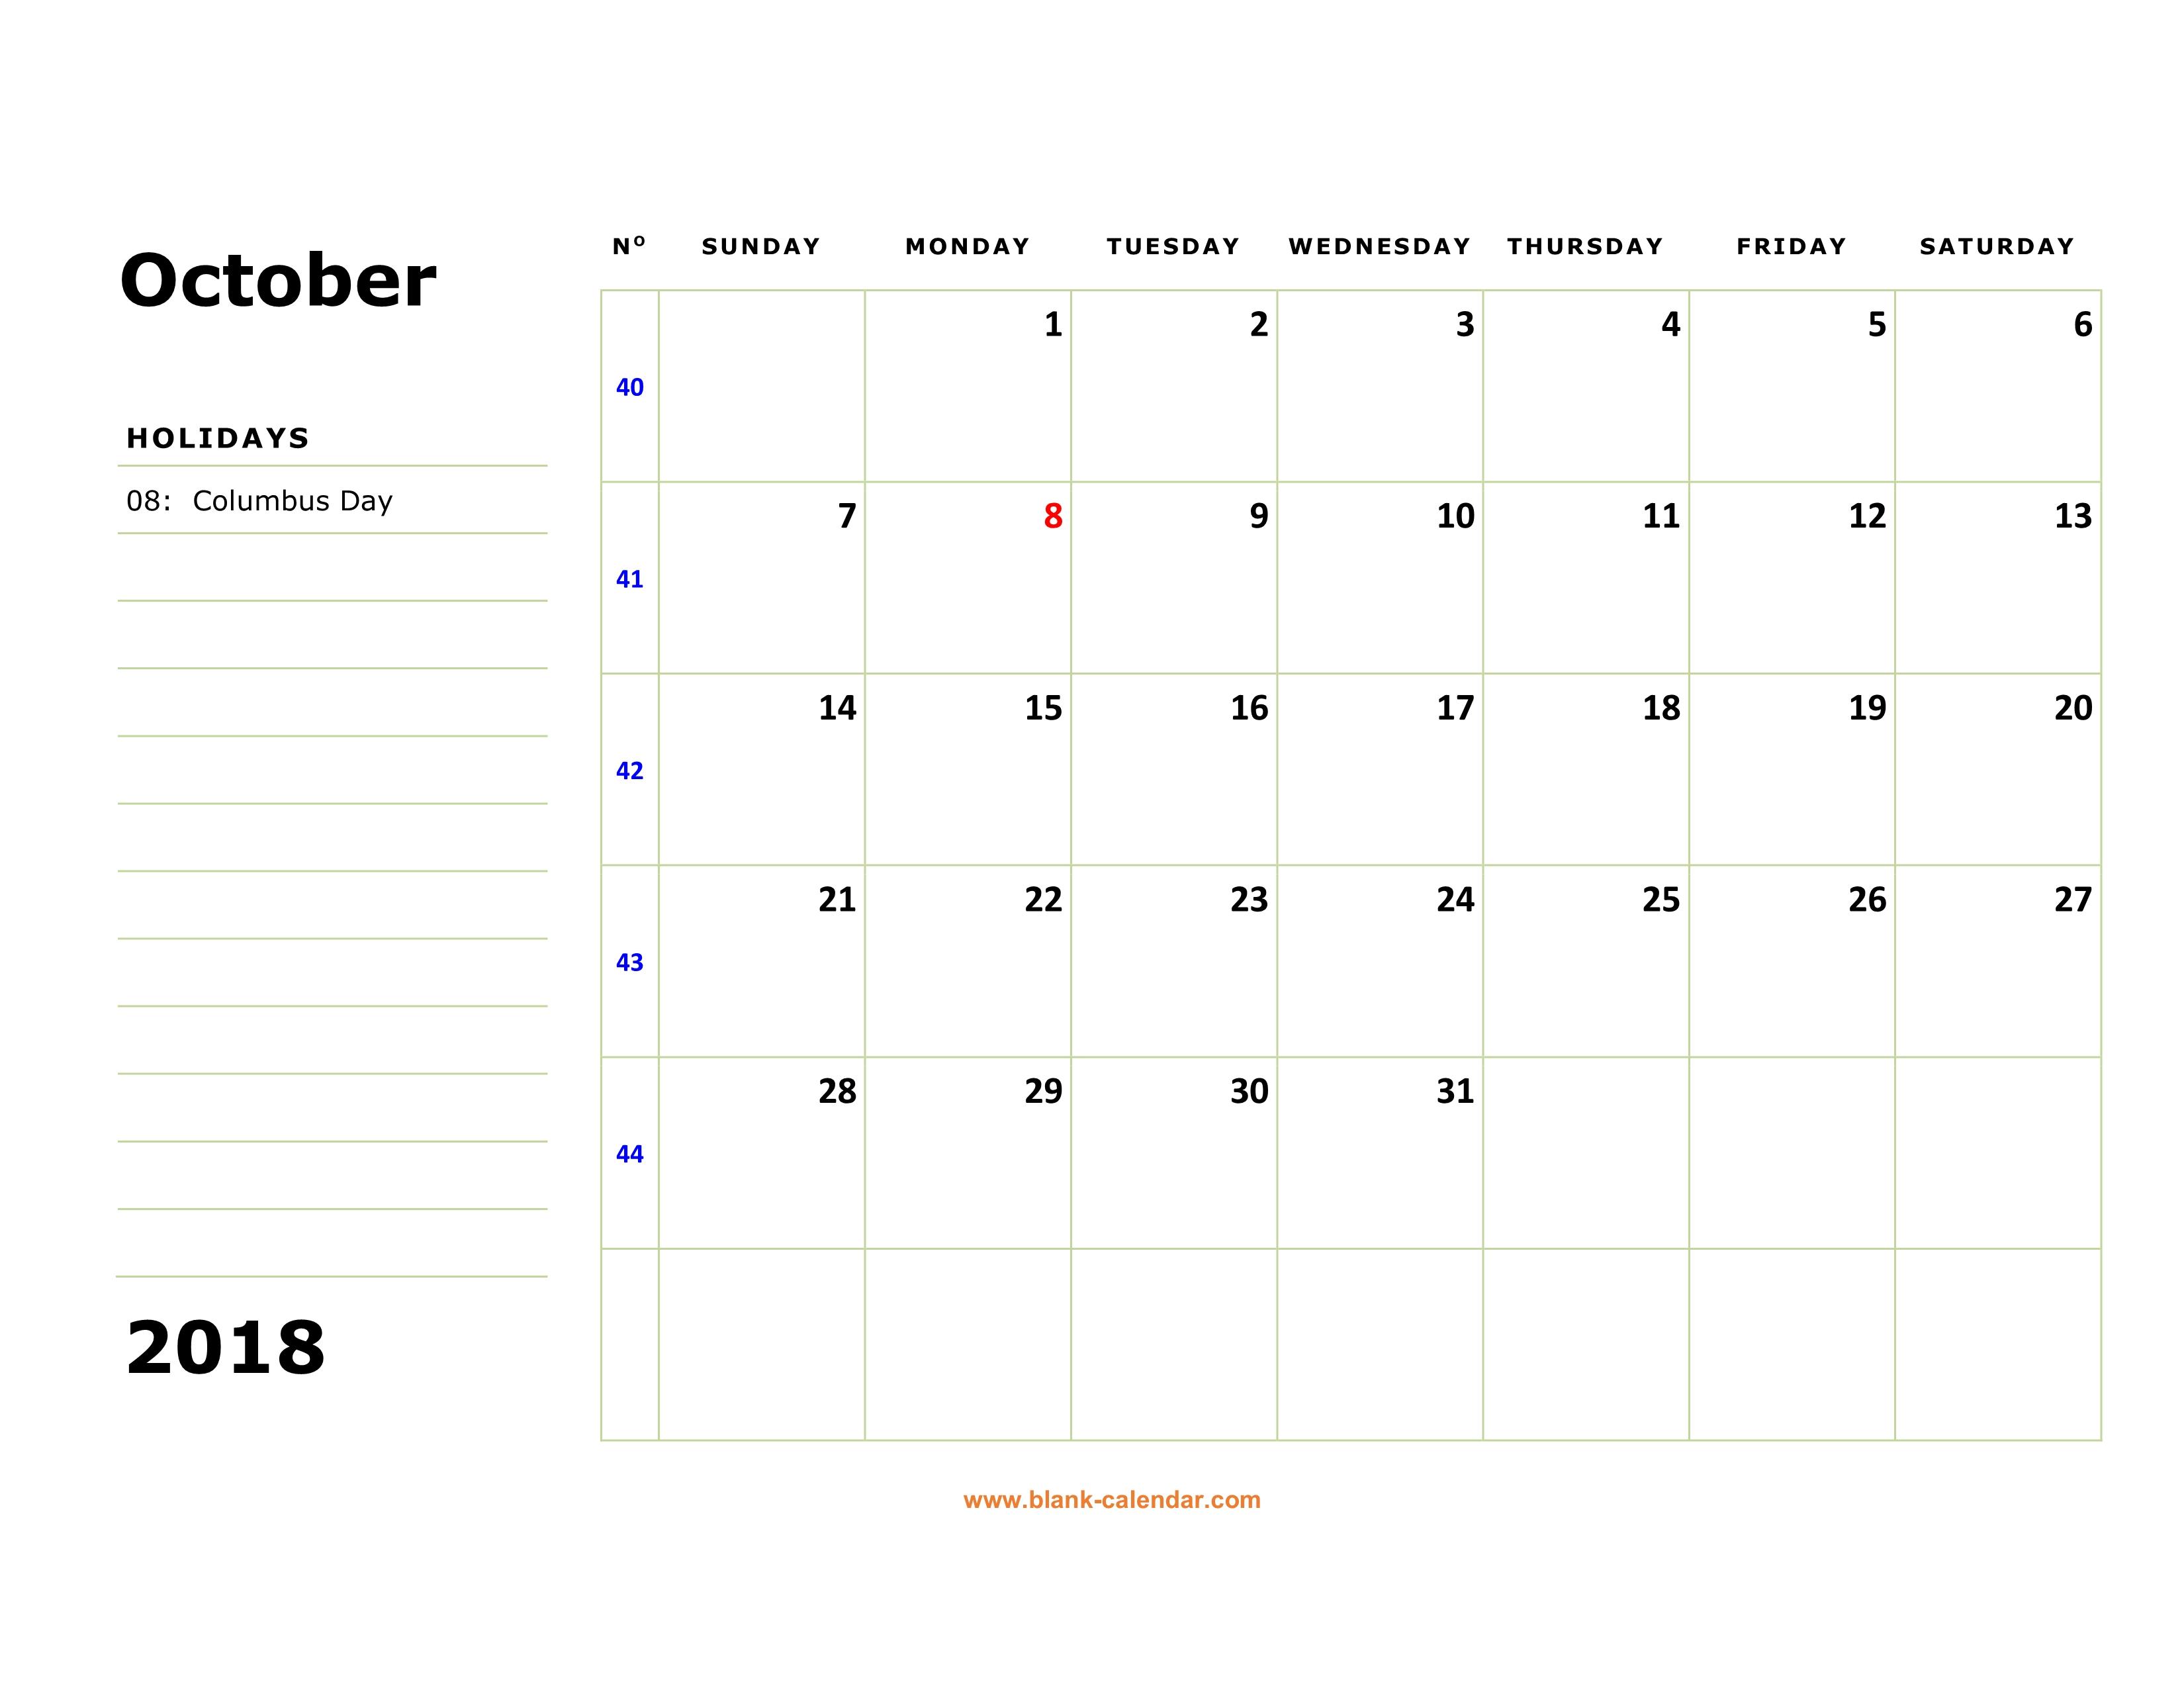 october 2018 blank calendar